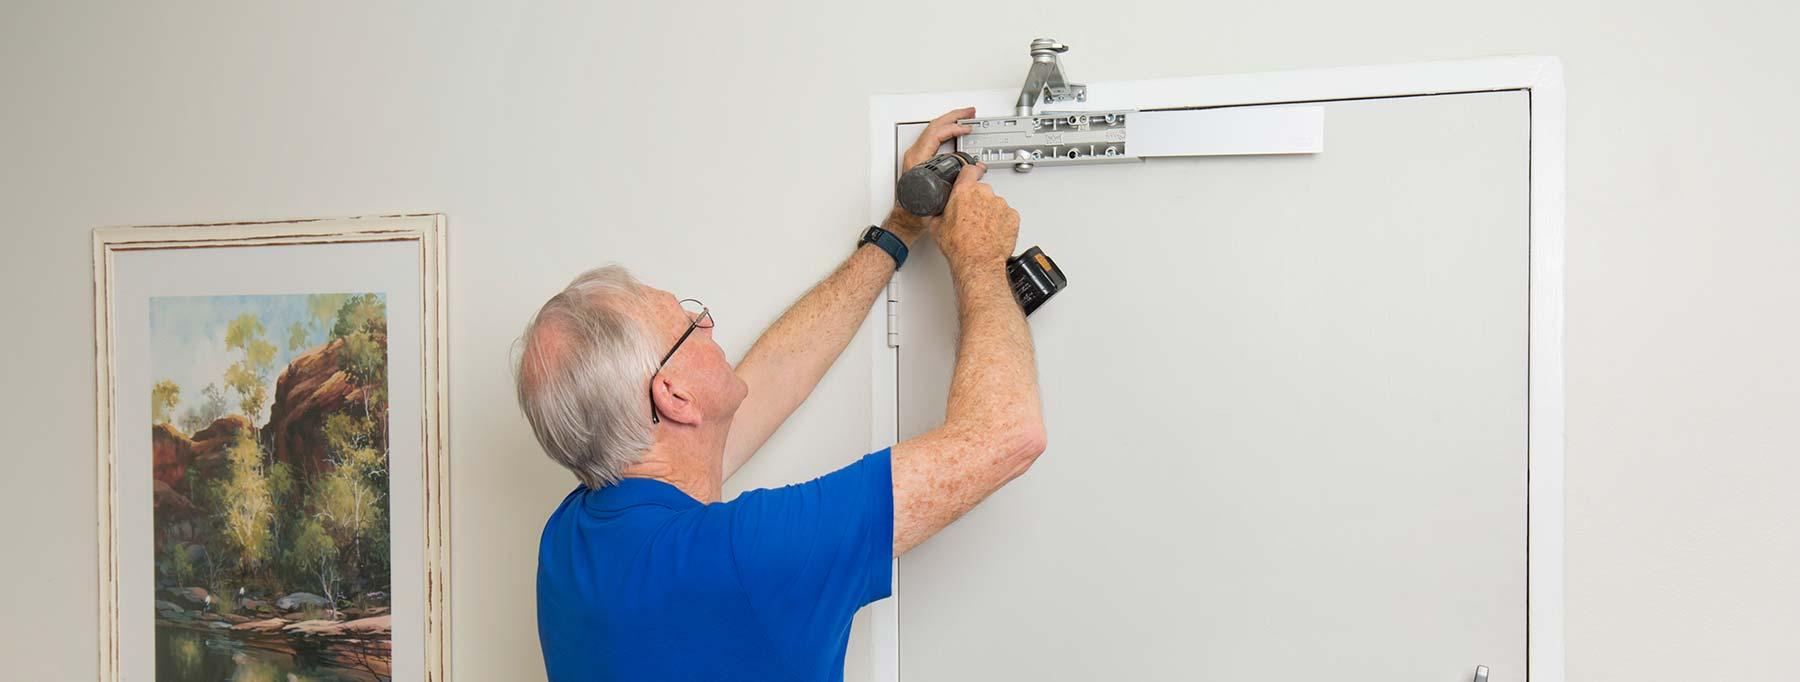 skilled tradesman and master locksmith